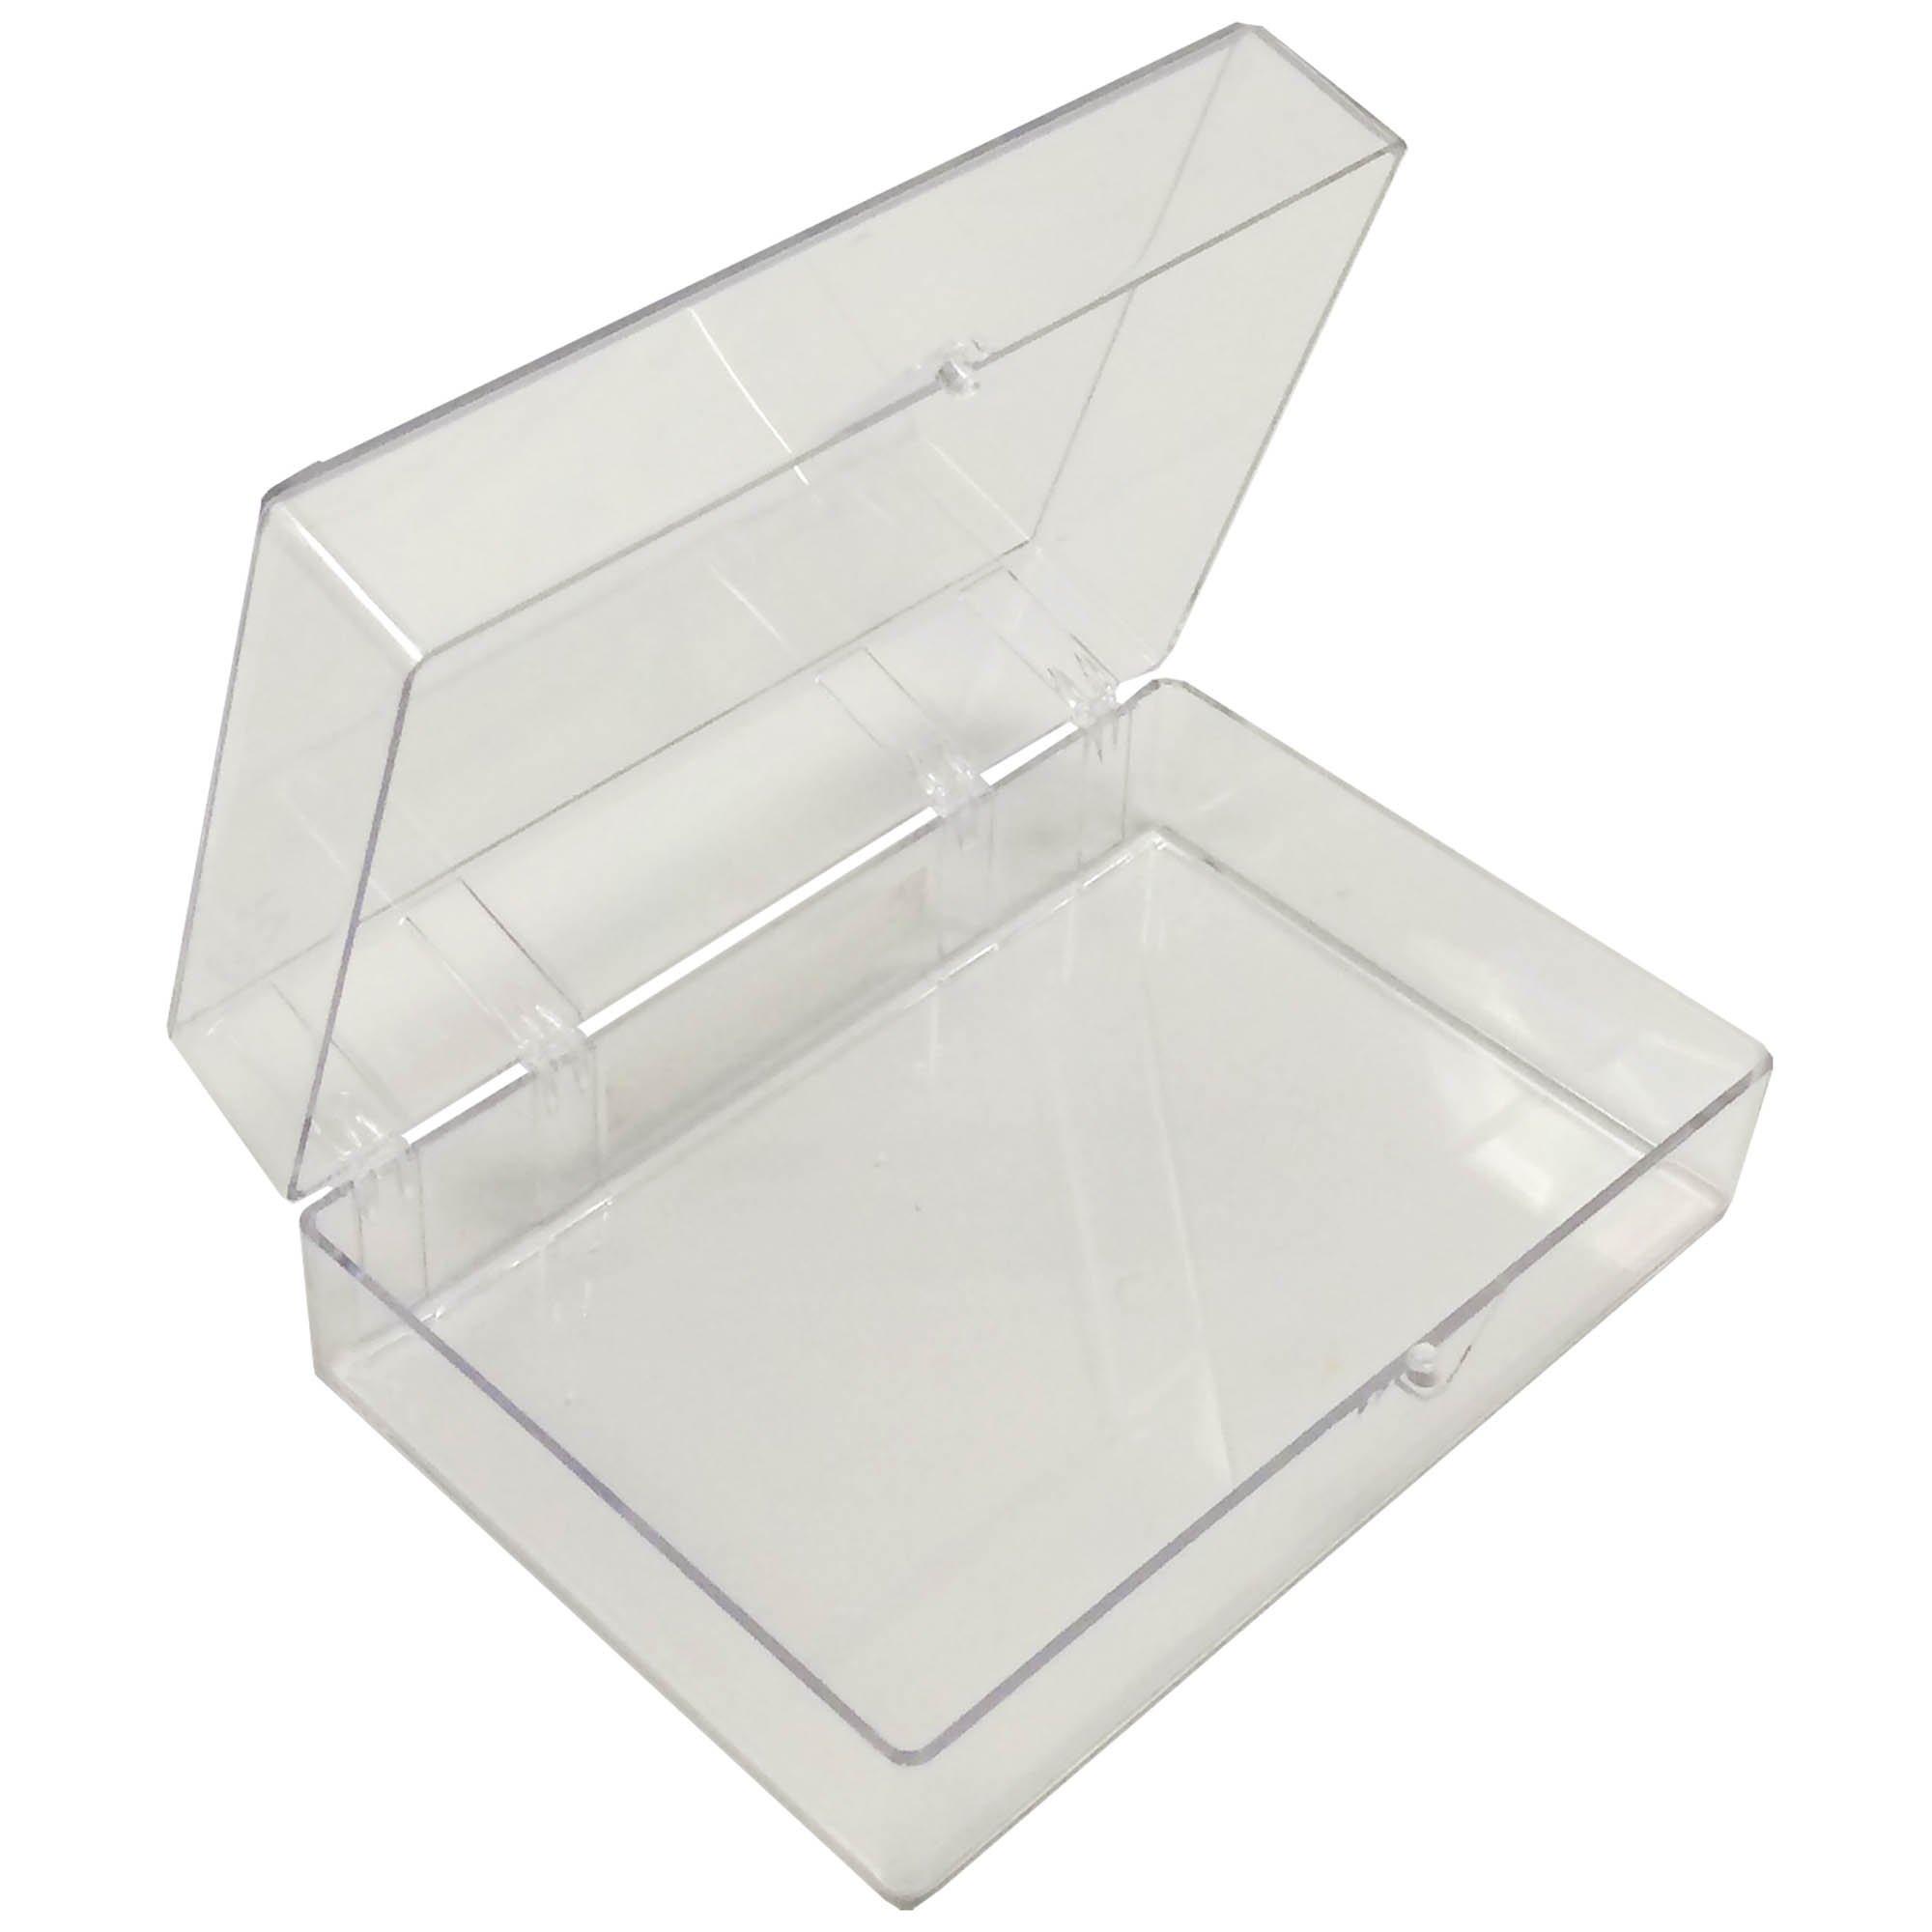 XXL Clear Western Blot Box - 6